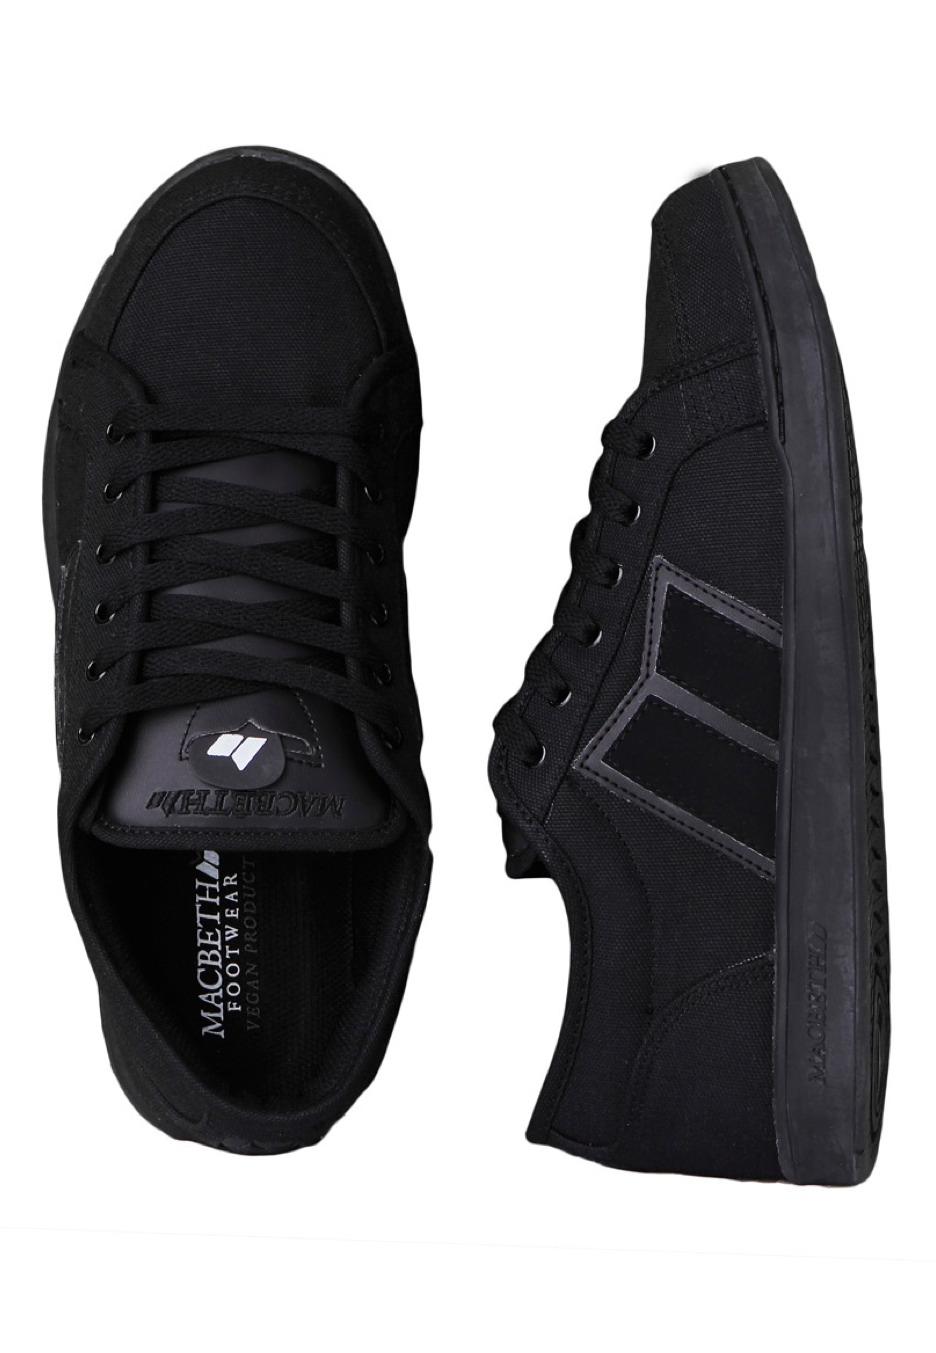 promo code 50e21 b2c21 Macbeth - Emerson Black/Black - Schuhe